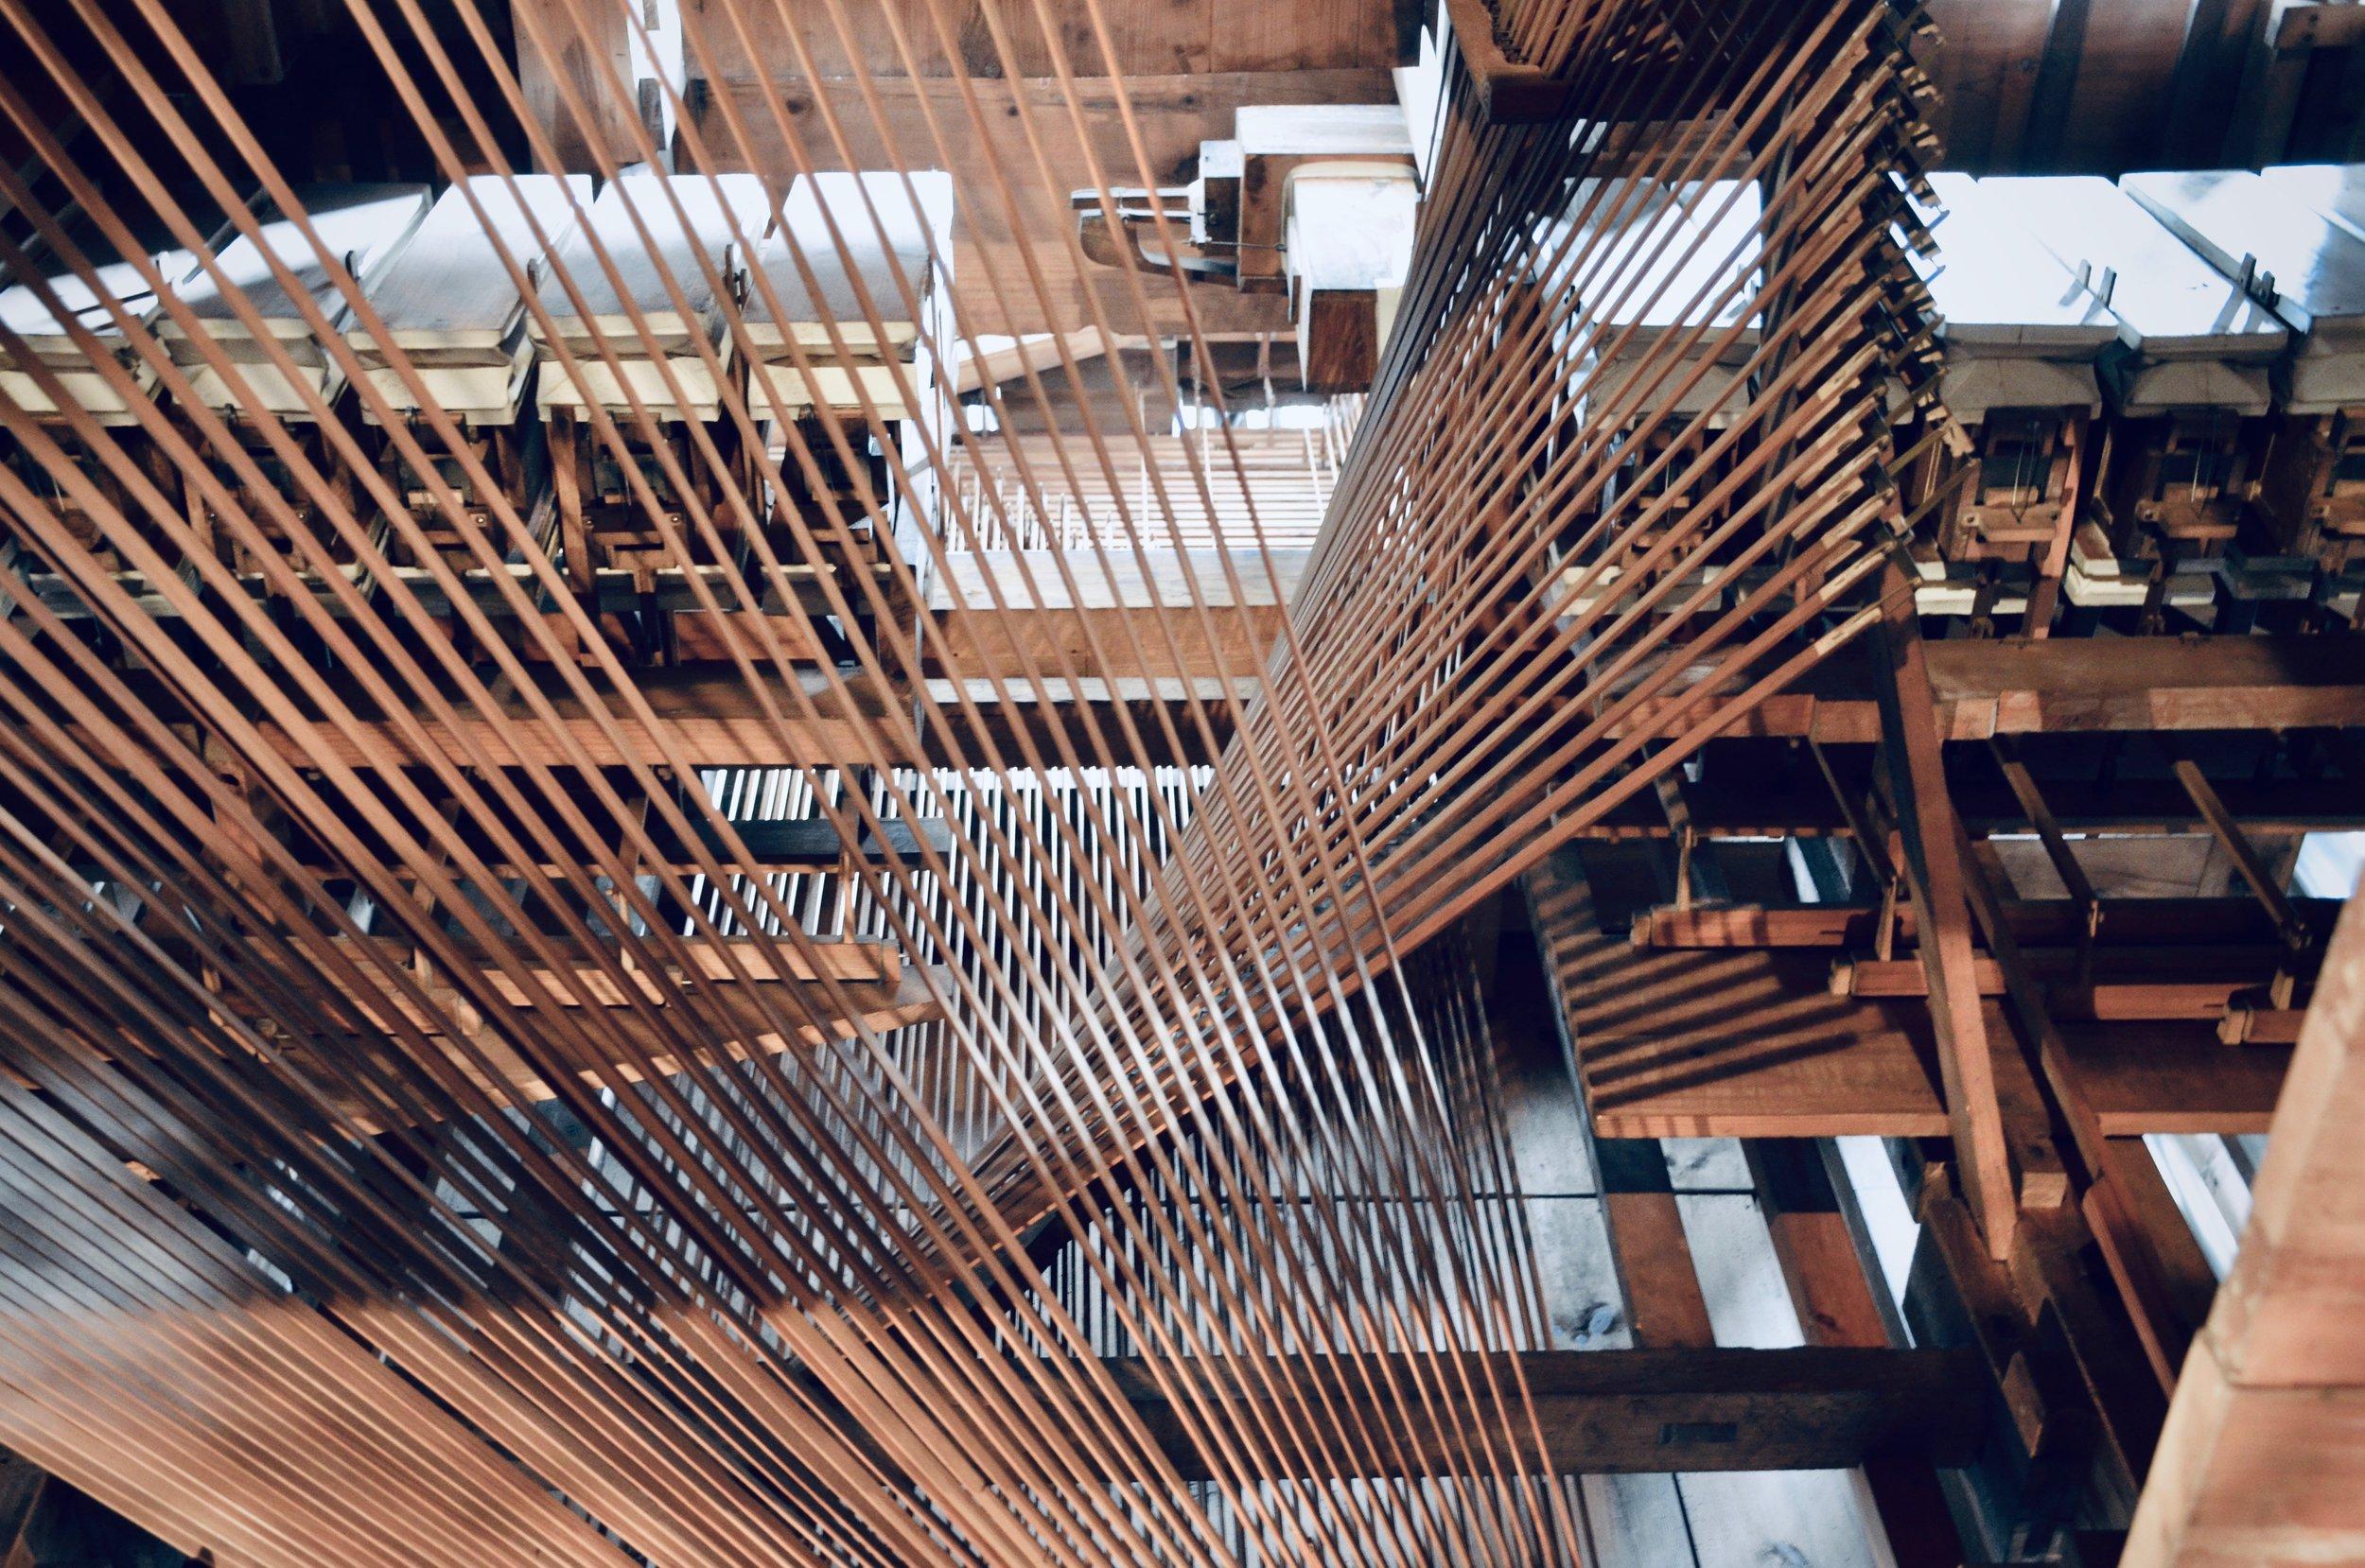 Mechanical detail, 1871 Ladegast Organ, Schwerin Dom. Boston Organ Studio.